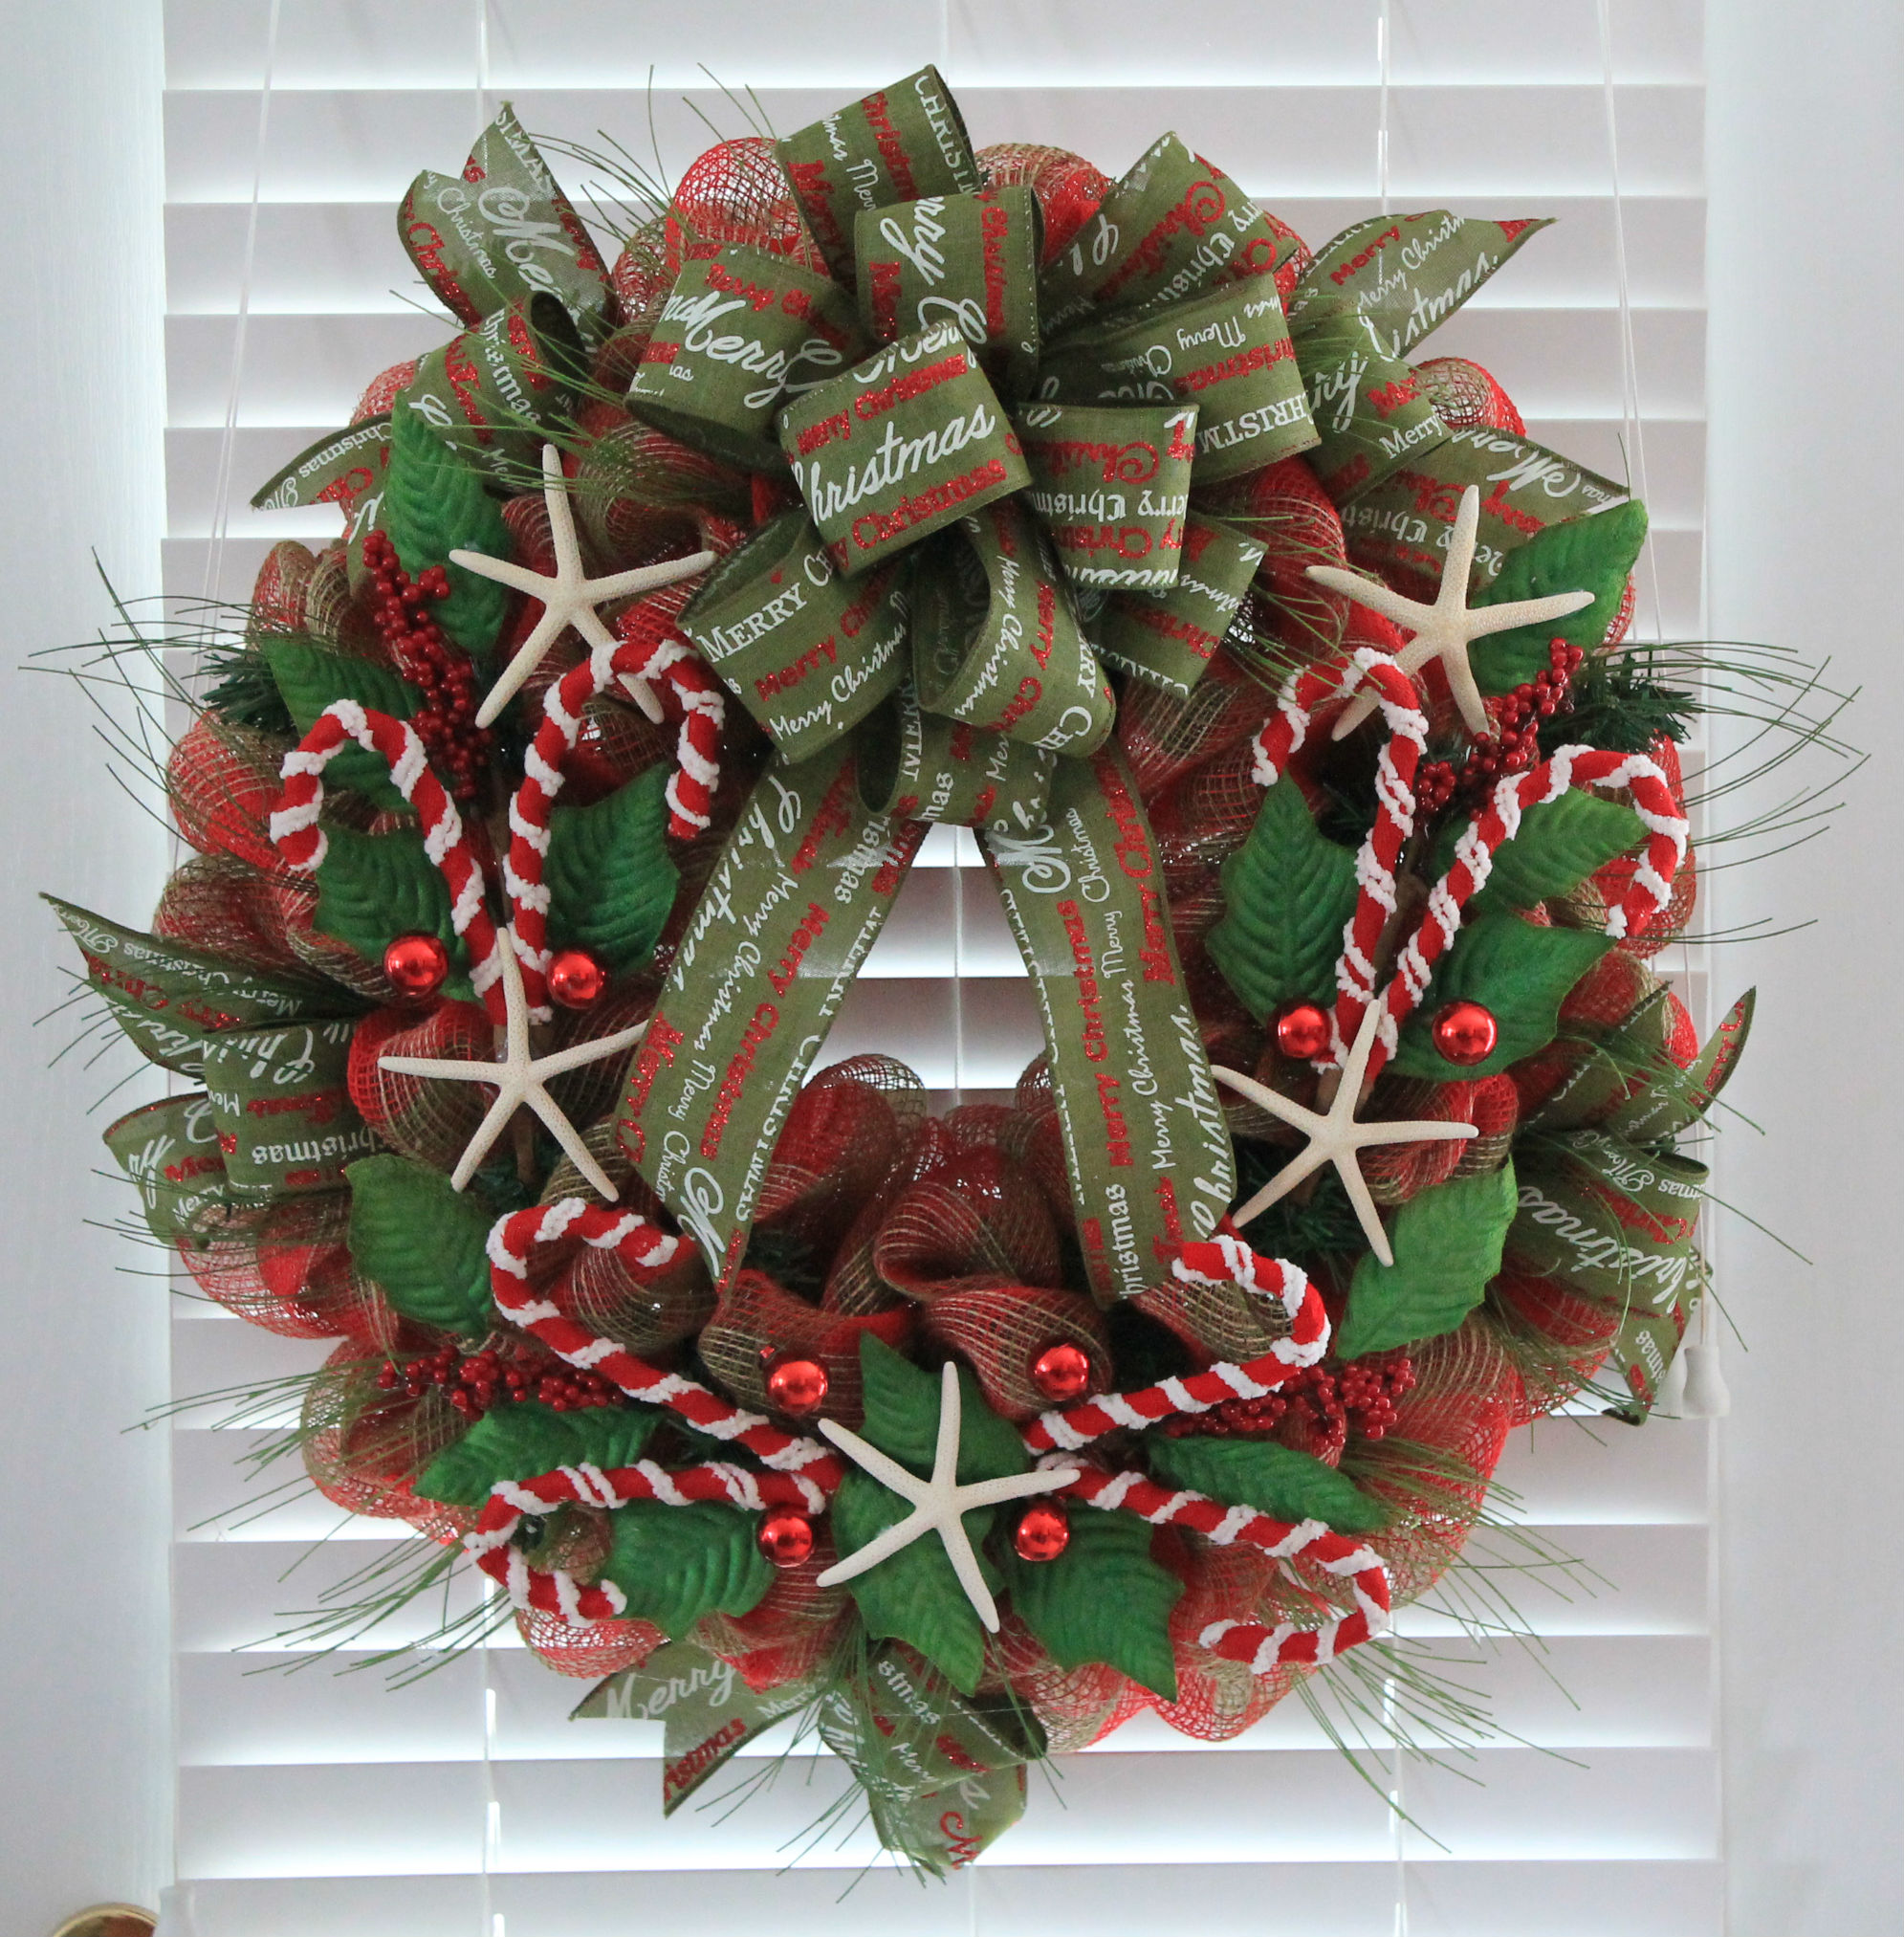 diy coastal christmas mesh wreath the wreath depot - Diy Christmas Wreath